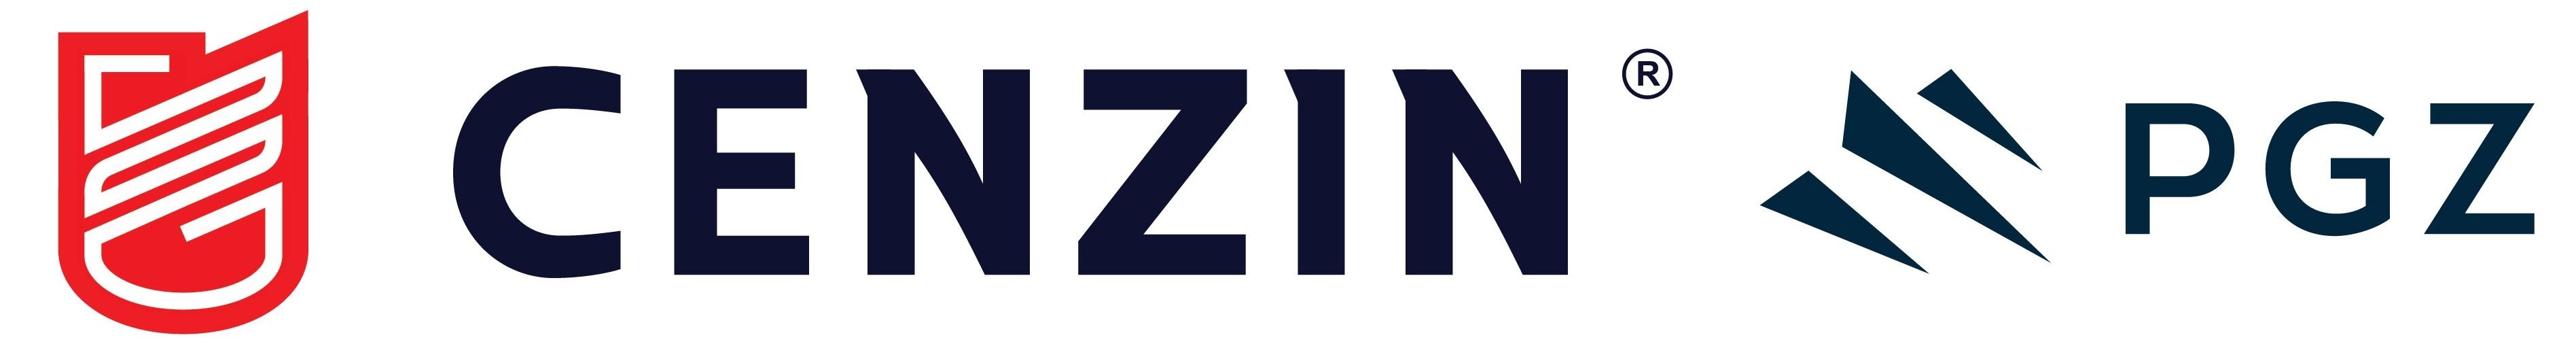 CENZIN logo